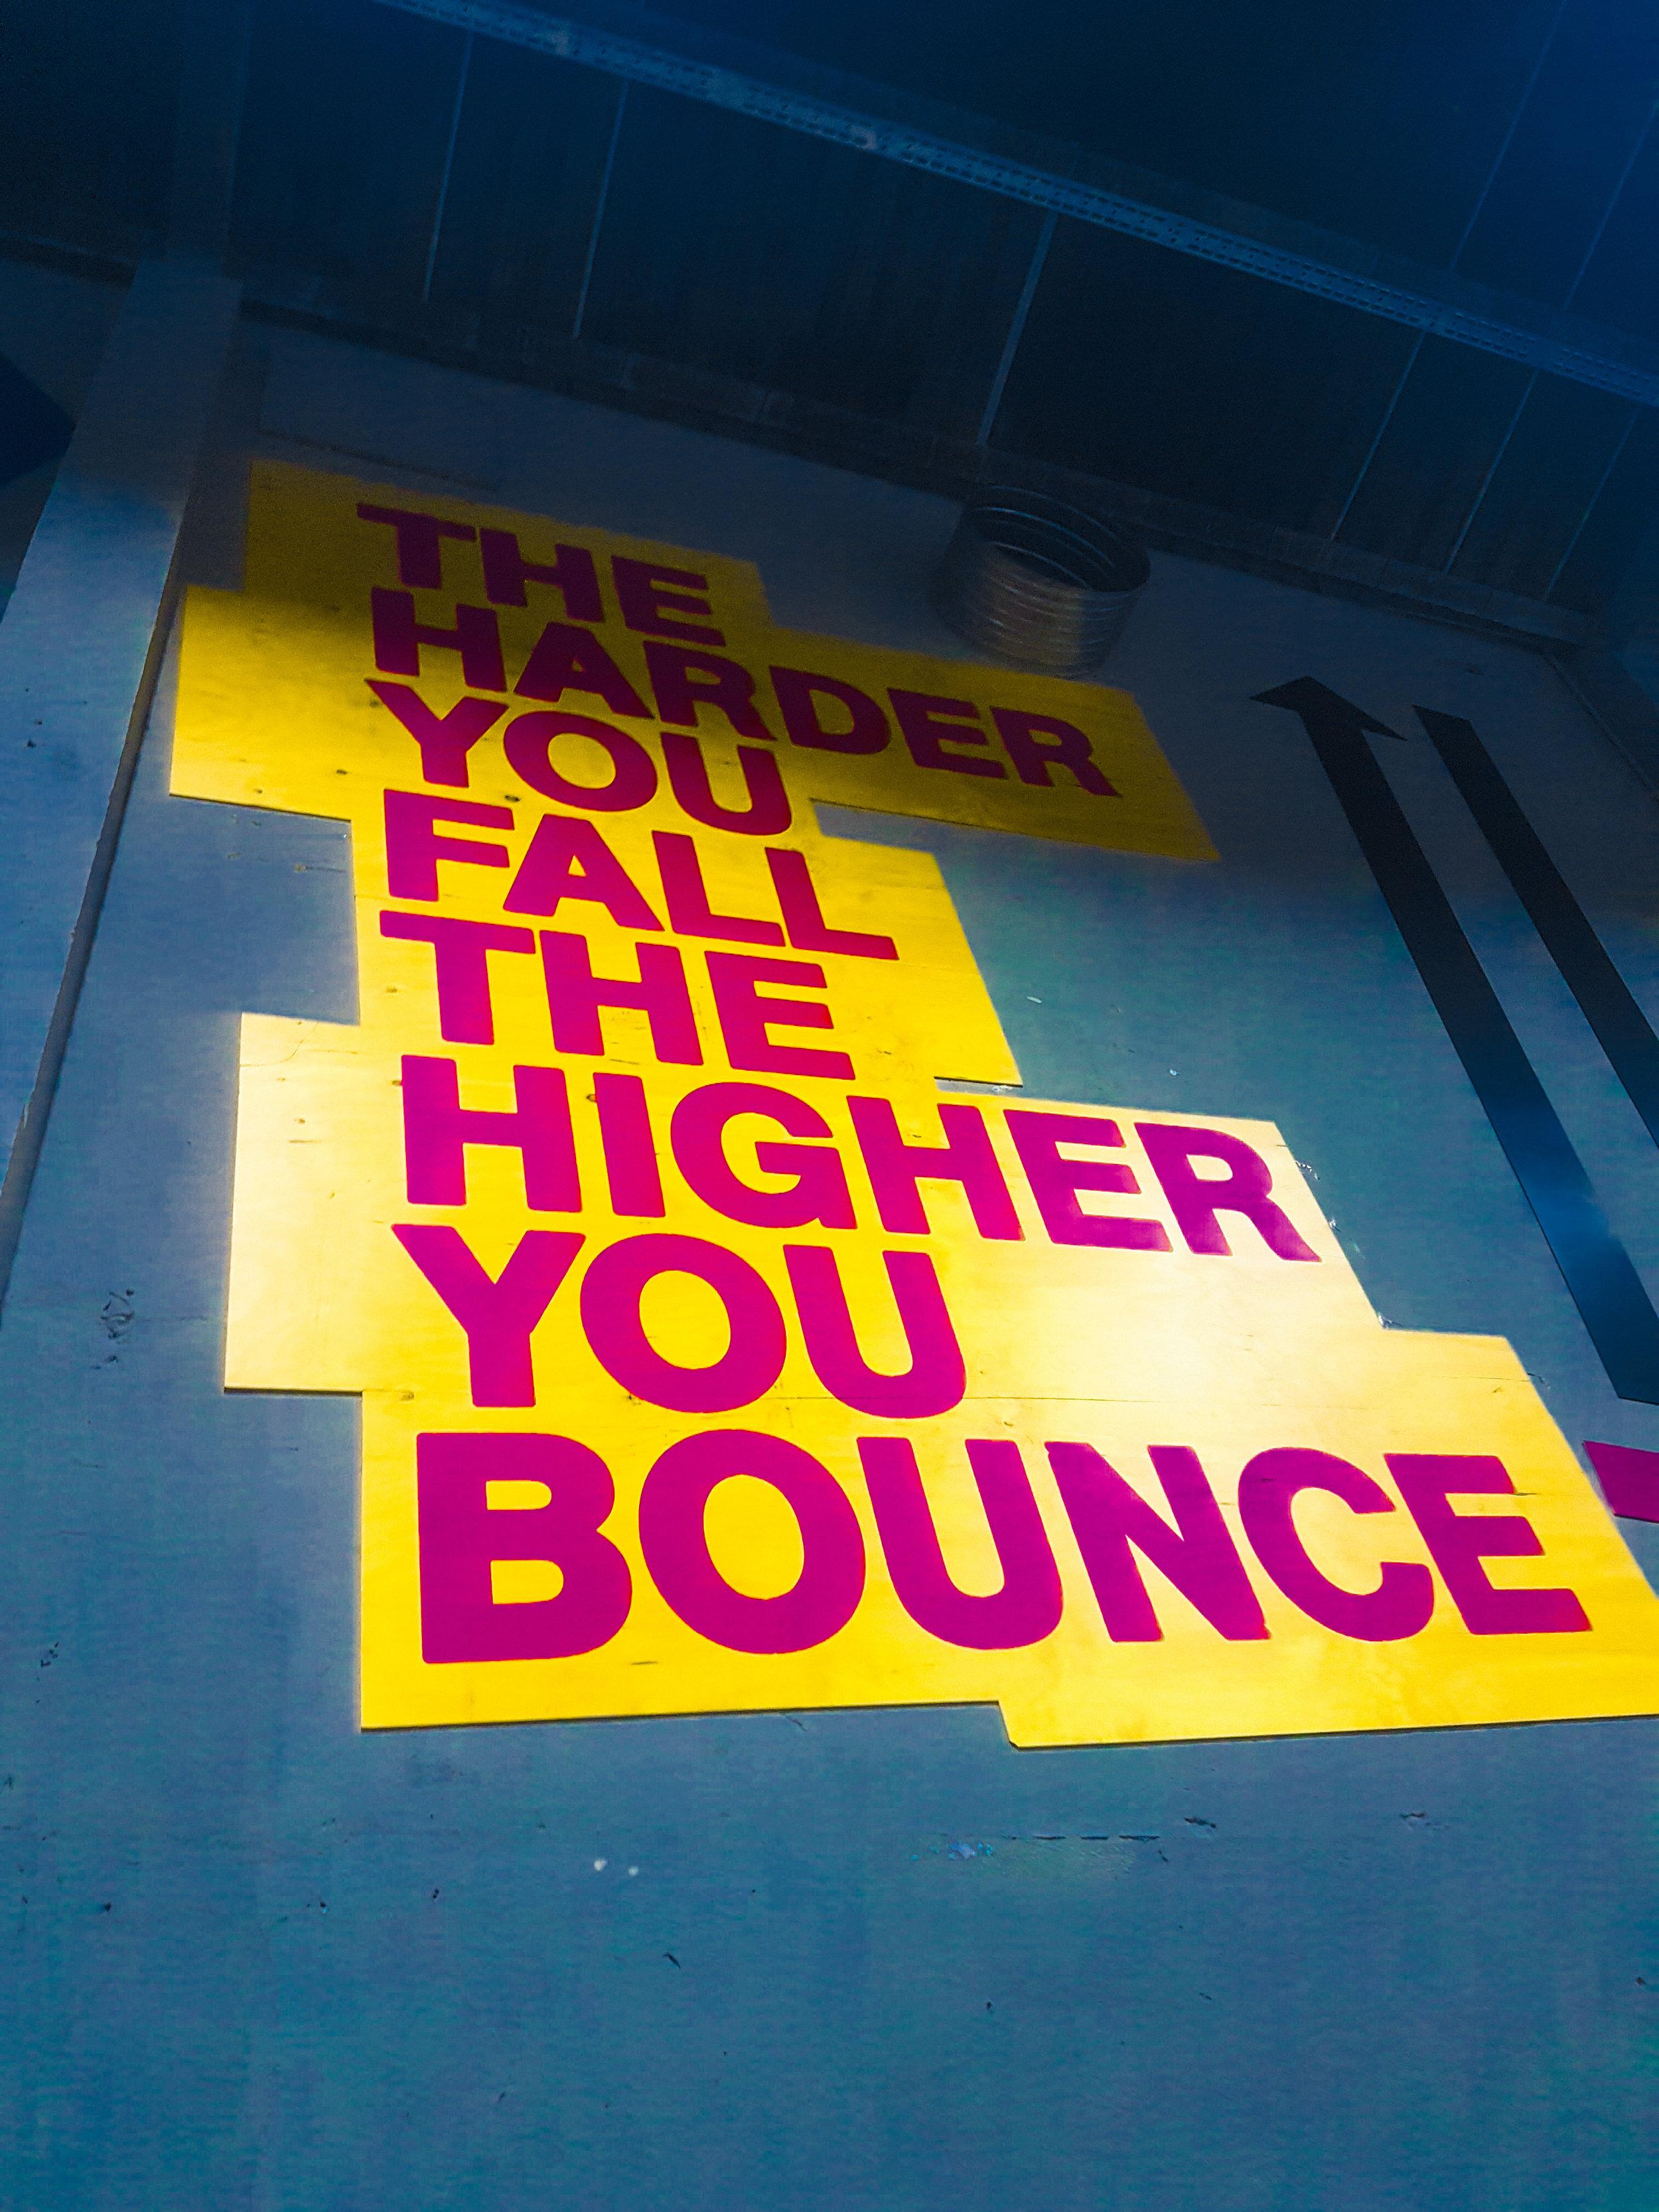 bounce_t20_x6KY7l.jpg